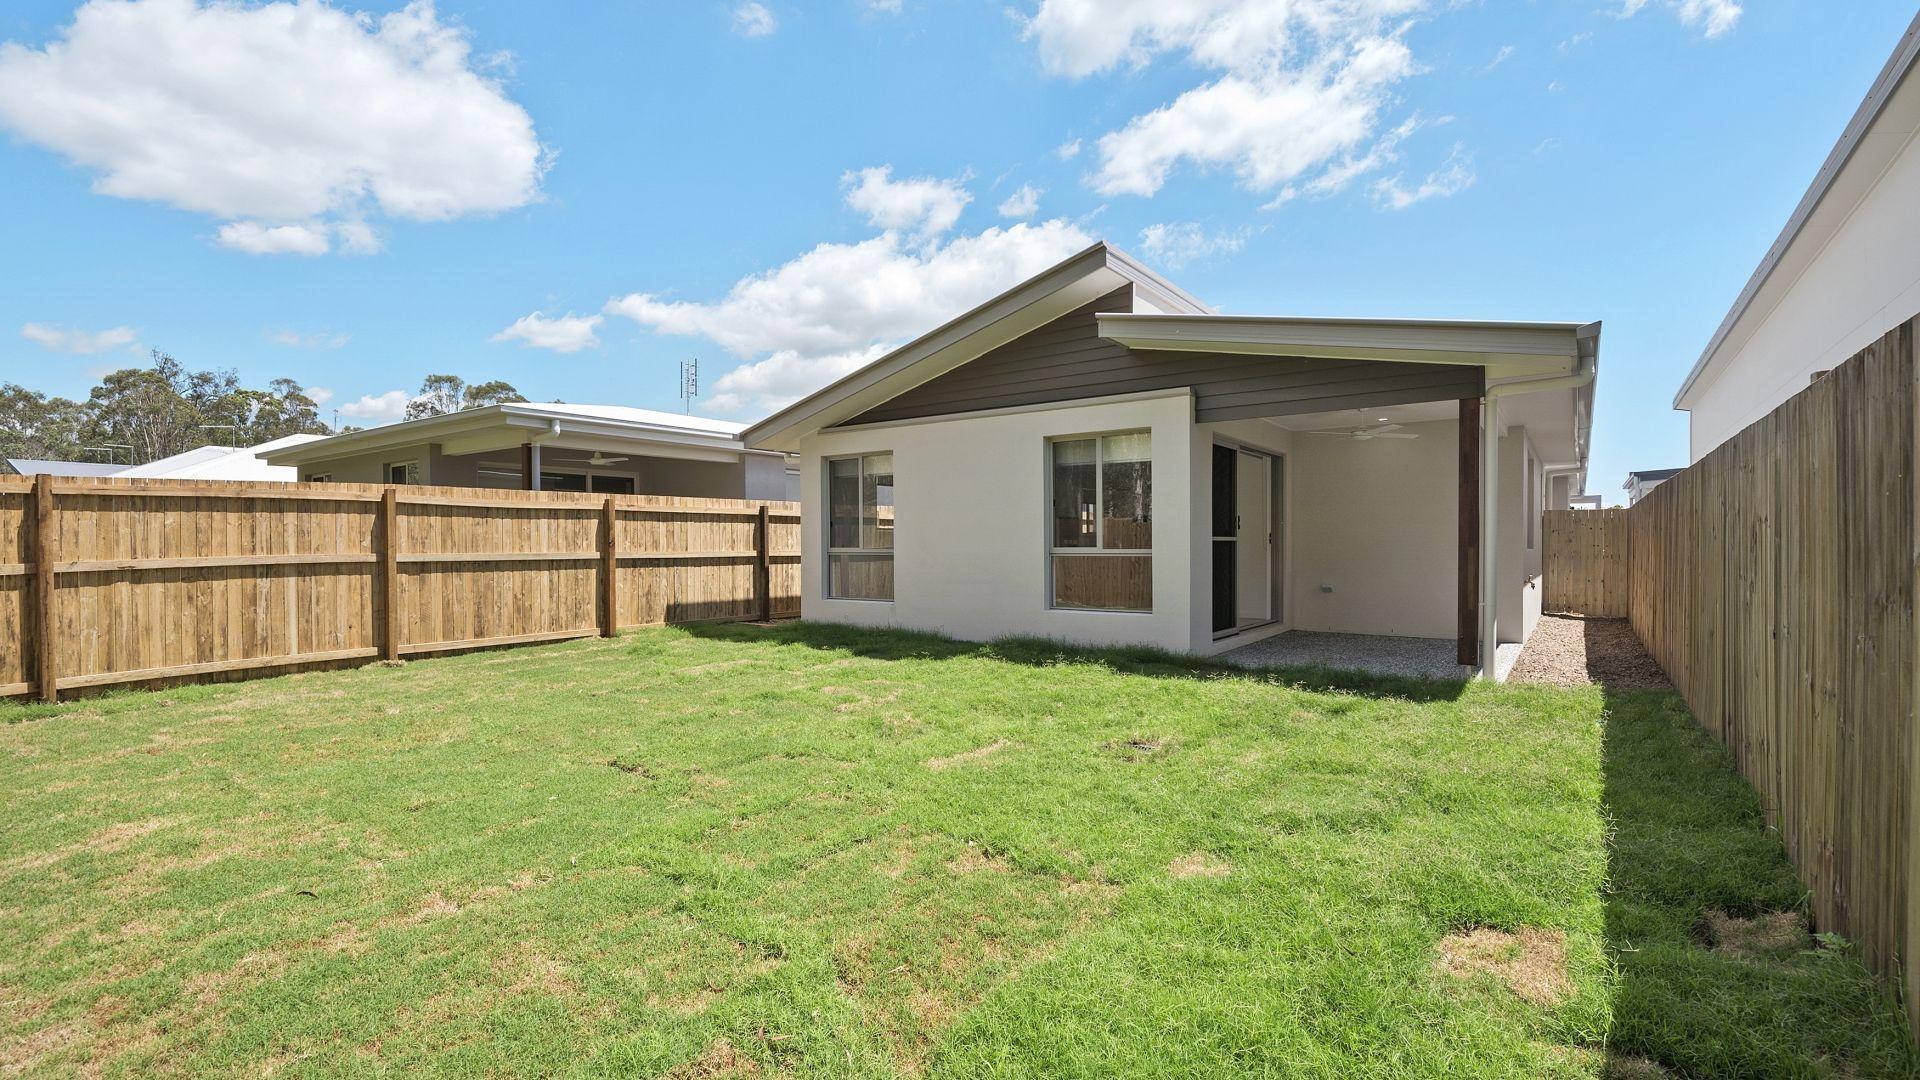 1/71 Jones Street, Rothwell QLD 4022, Image 8